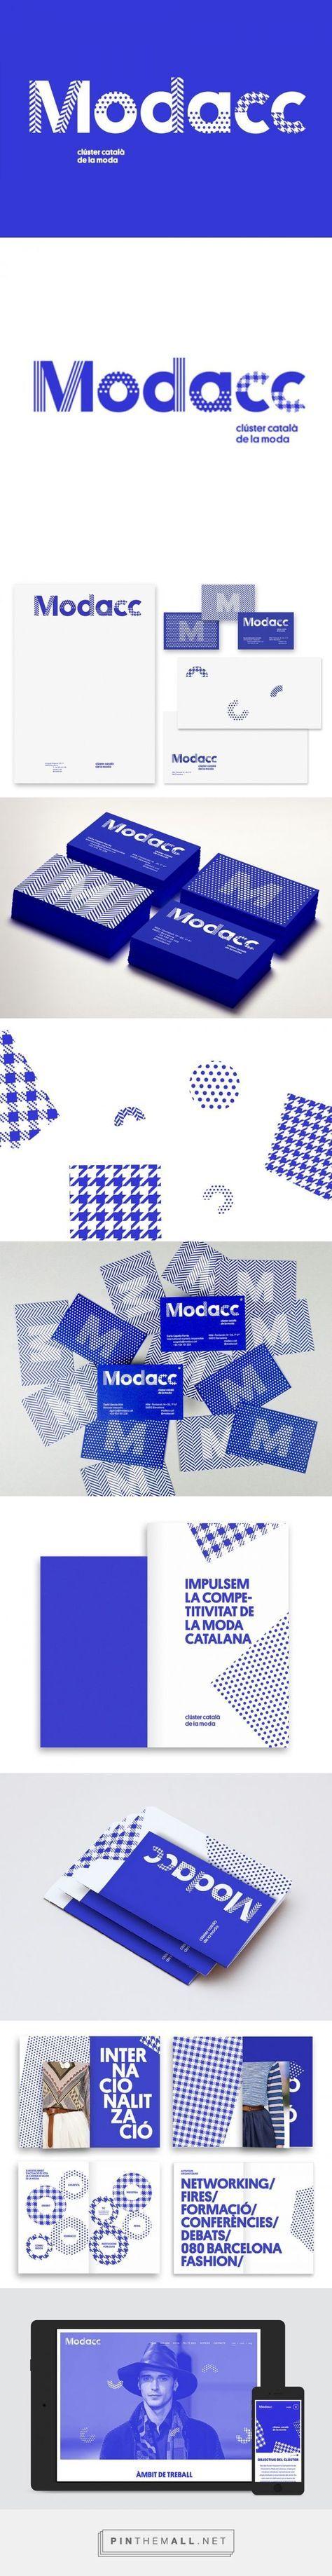 Pattern combination